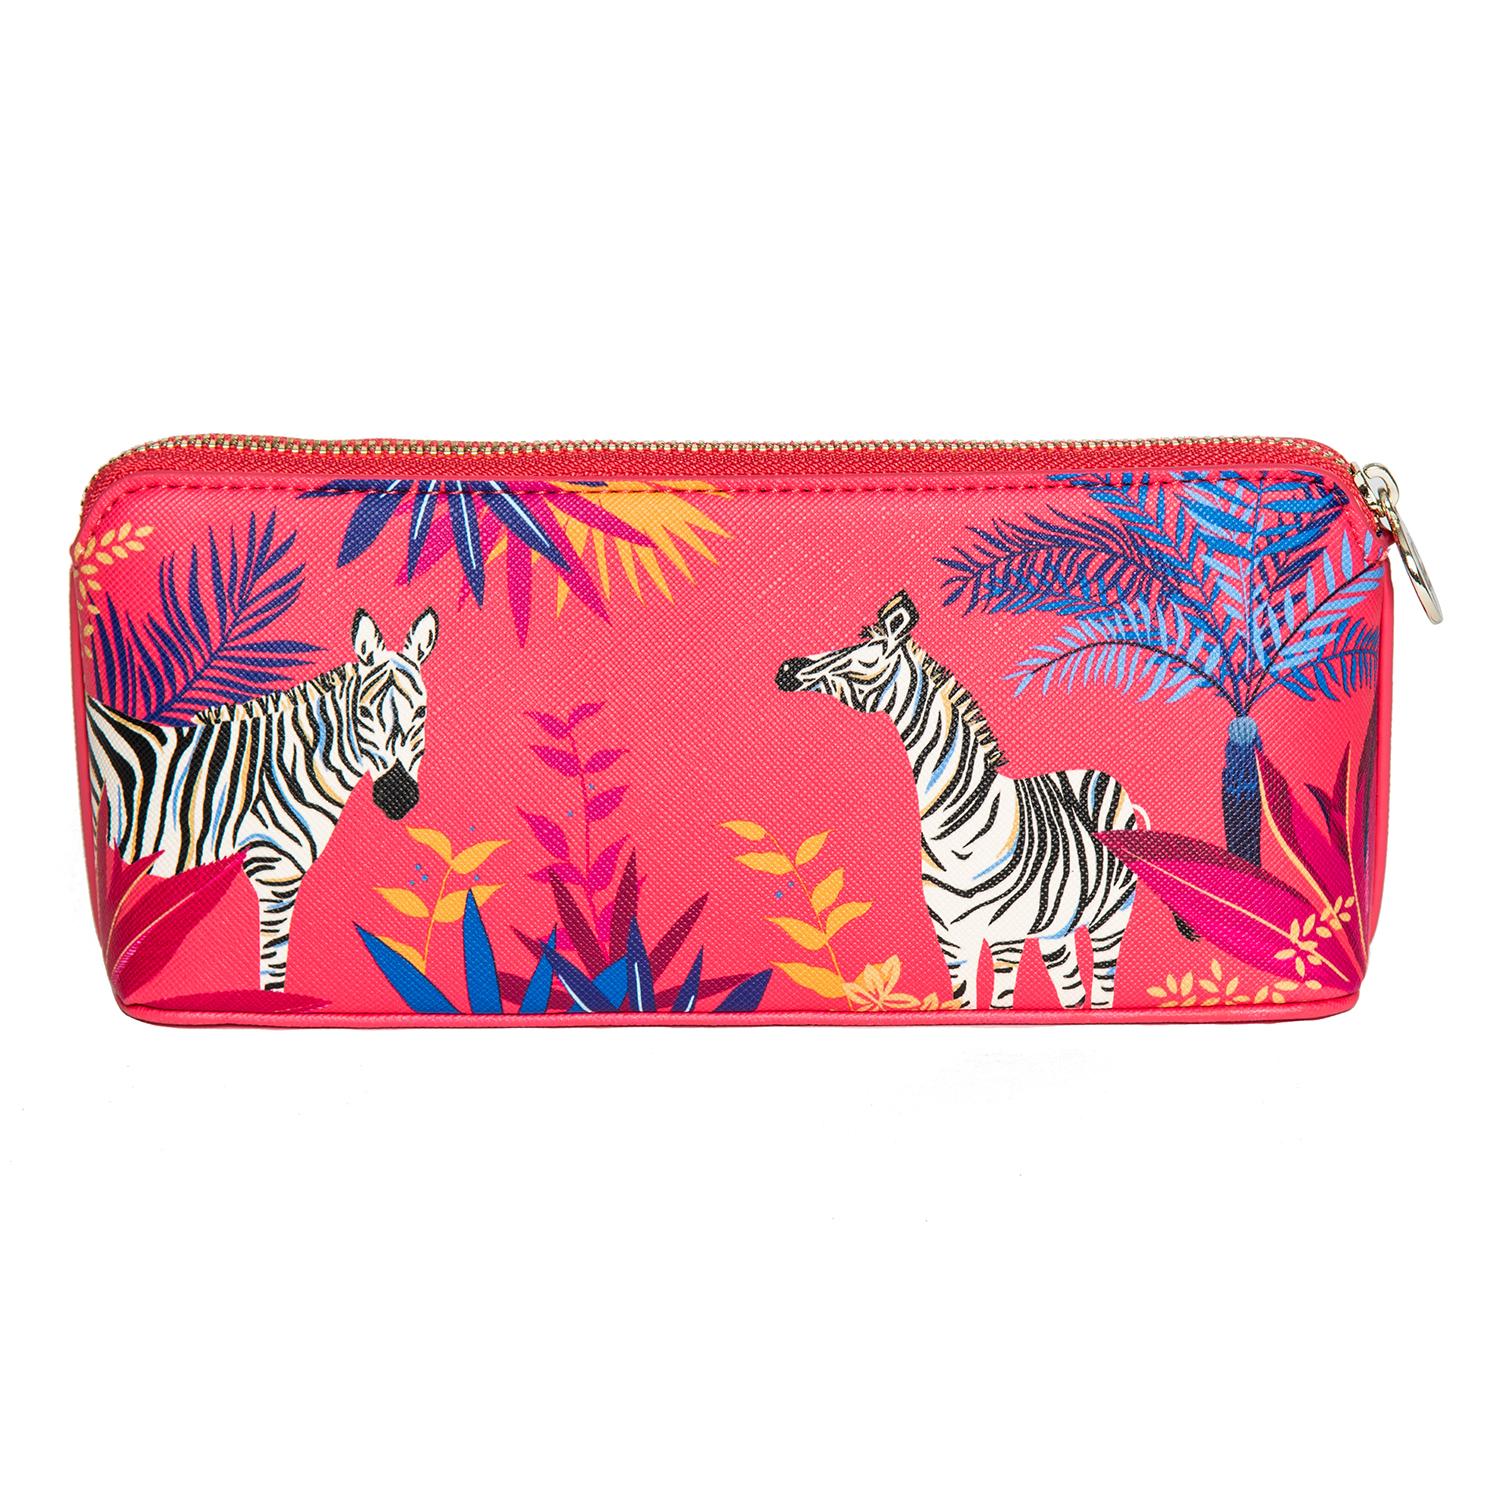 Sara Miller – Orange Tahiti Zebra Design Large Pencil Case